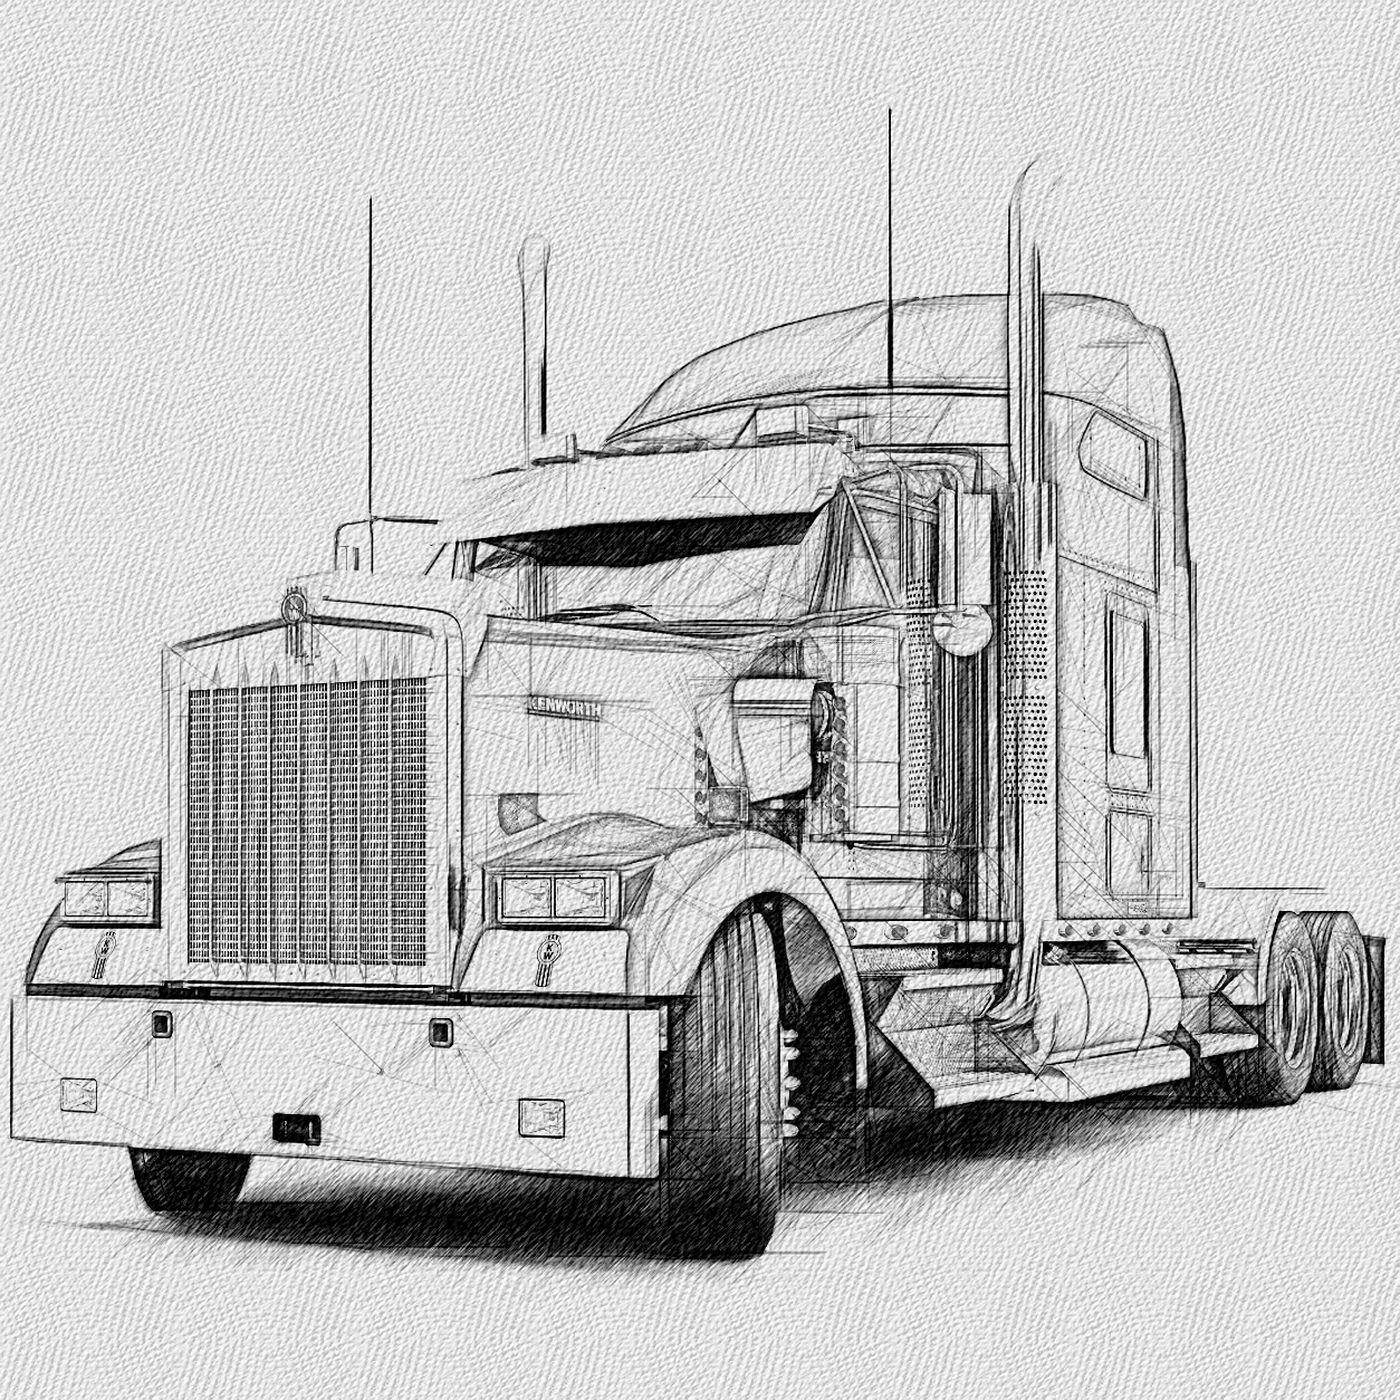 Kenworth Tractor Cab Lh Frt Camion Dibujo Tatuaje De Camion Camiones